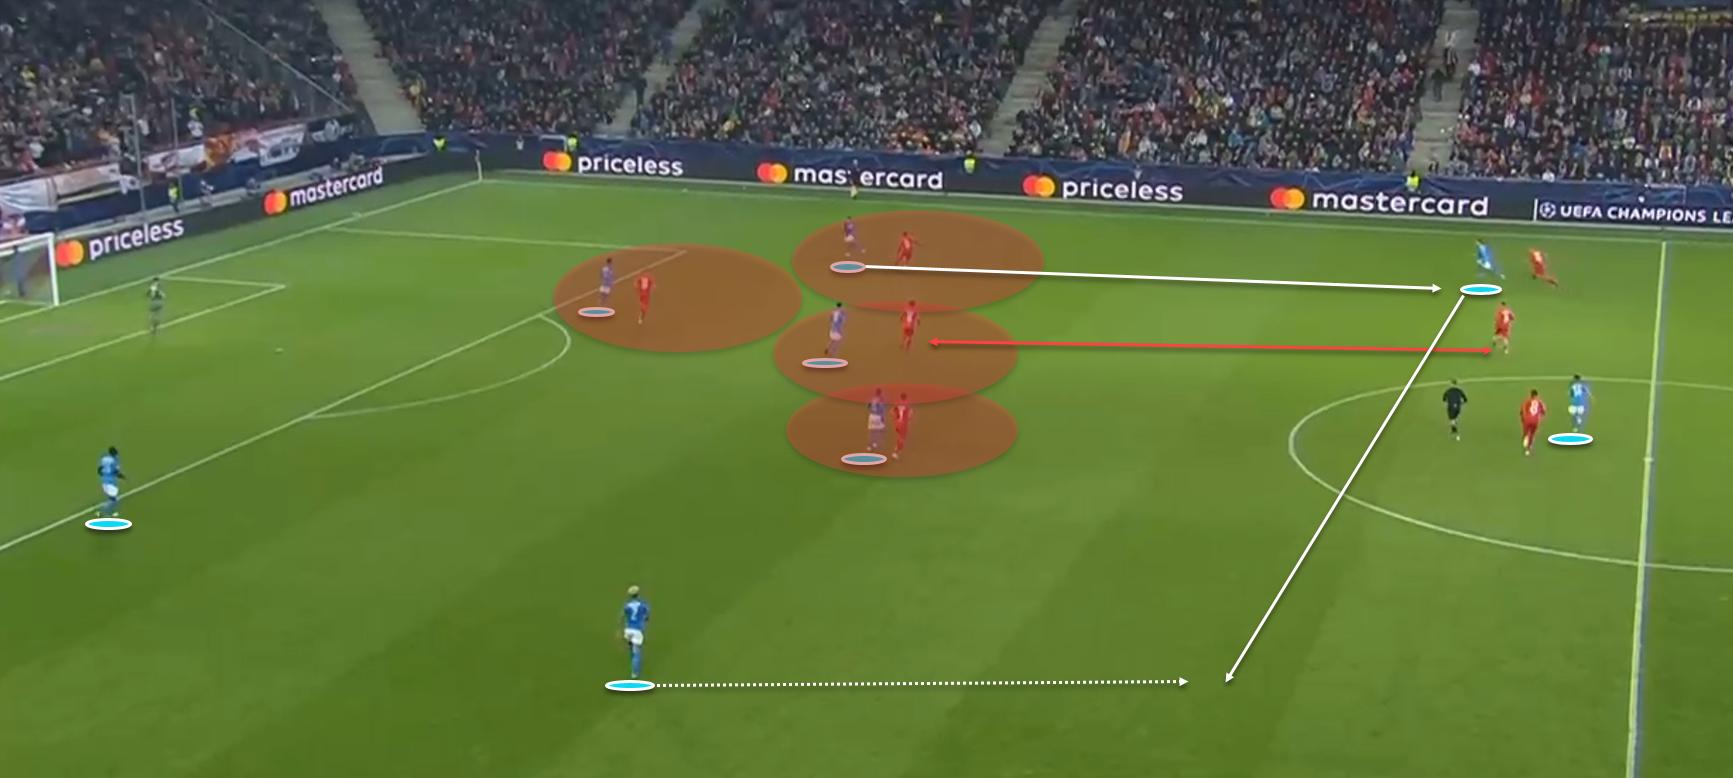 UEFA Champions League 2019/20: Red Bull Salzburg vs Napoli - tactical analysis tactics